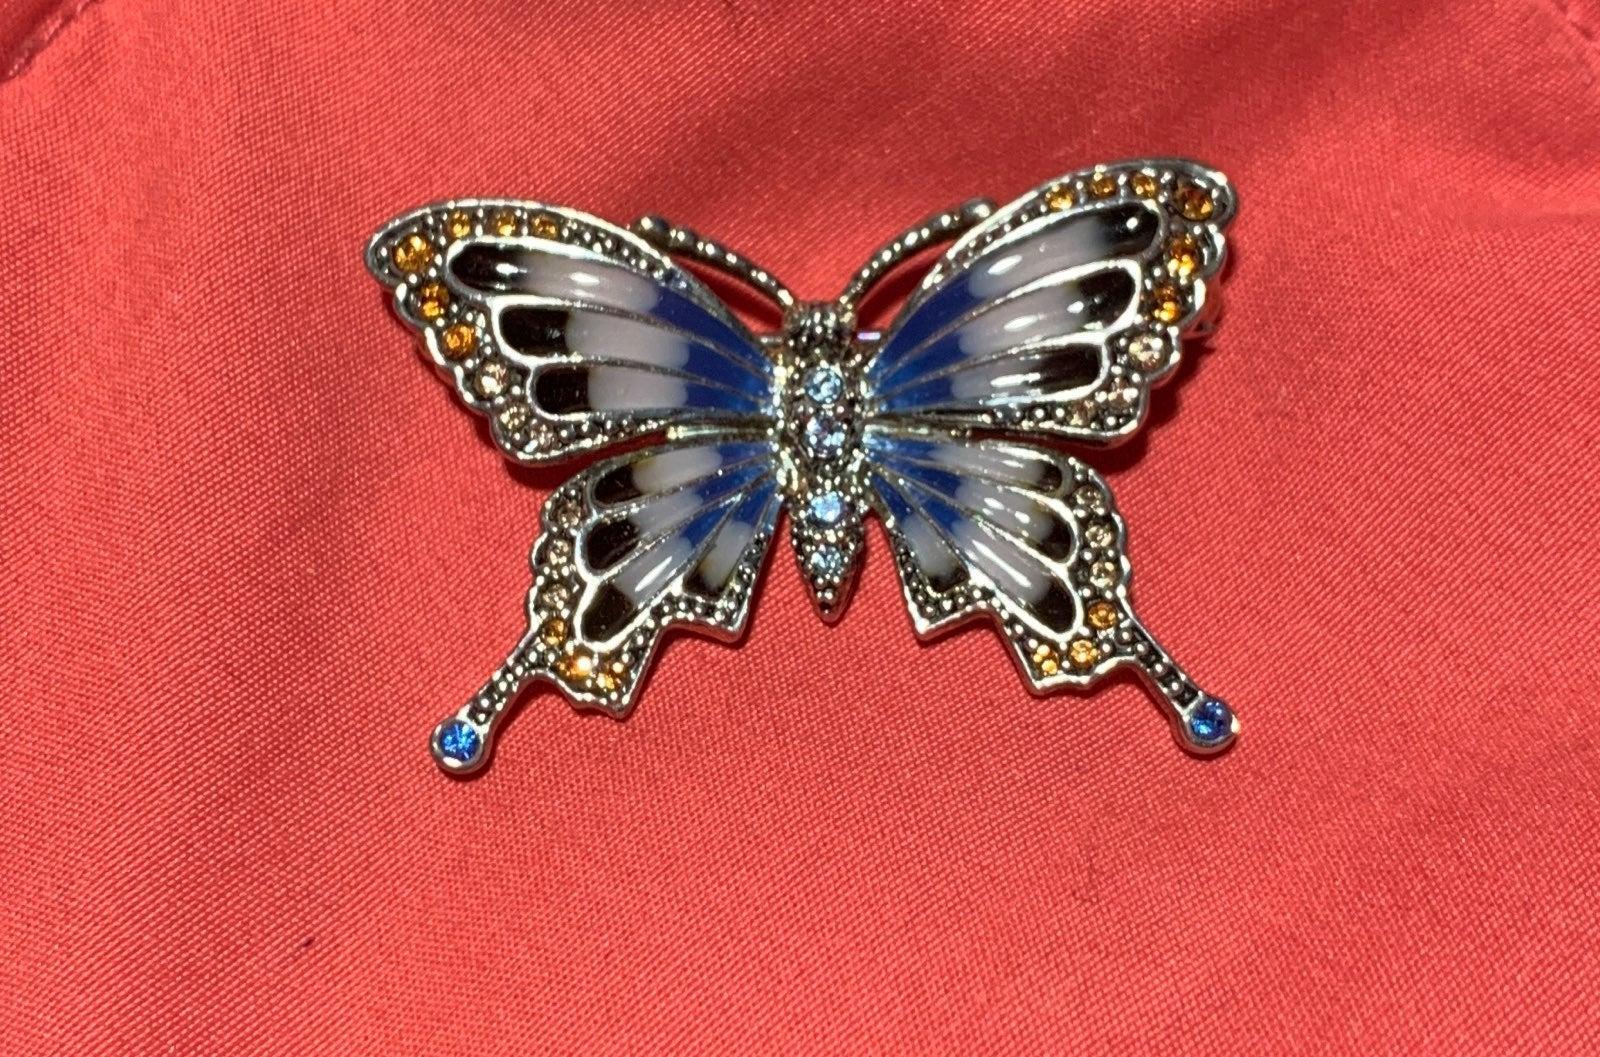 VTG MONET BUTTERFLY BROOCH SILVER BLUE